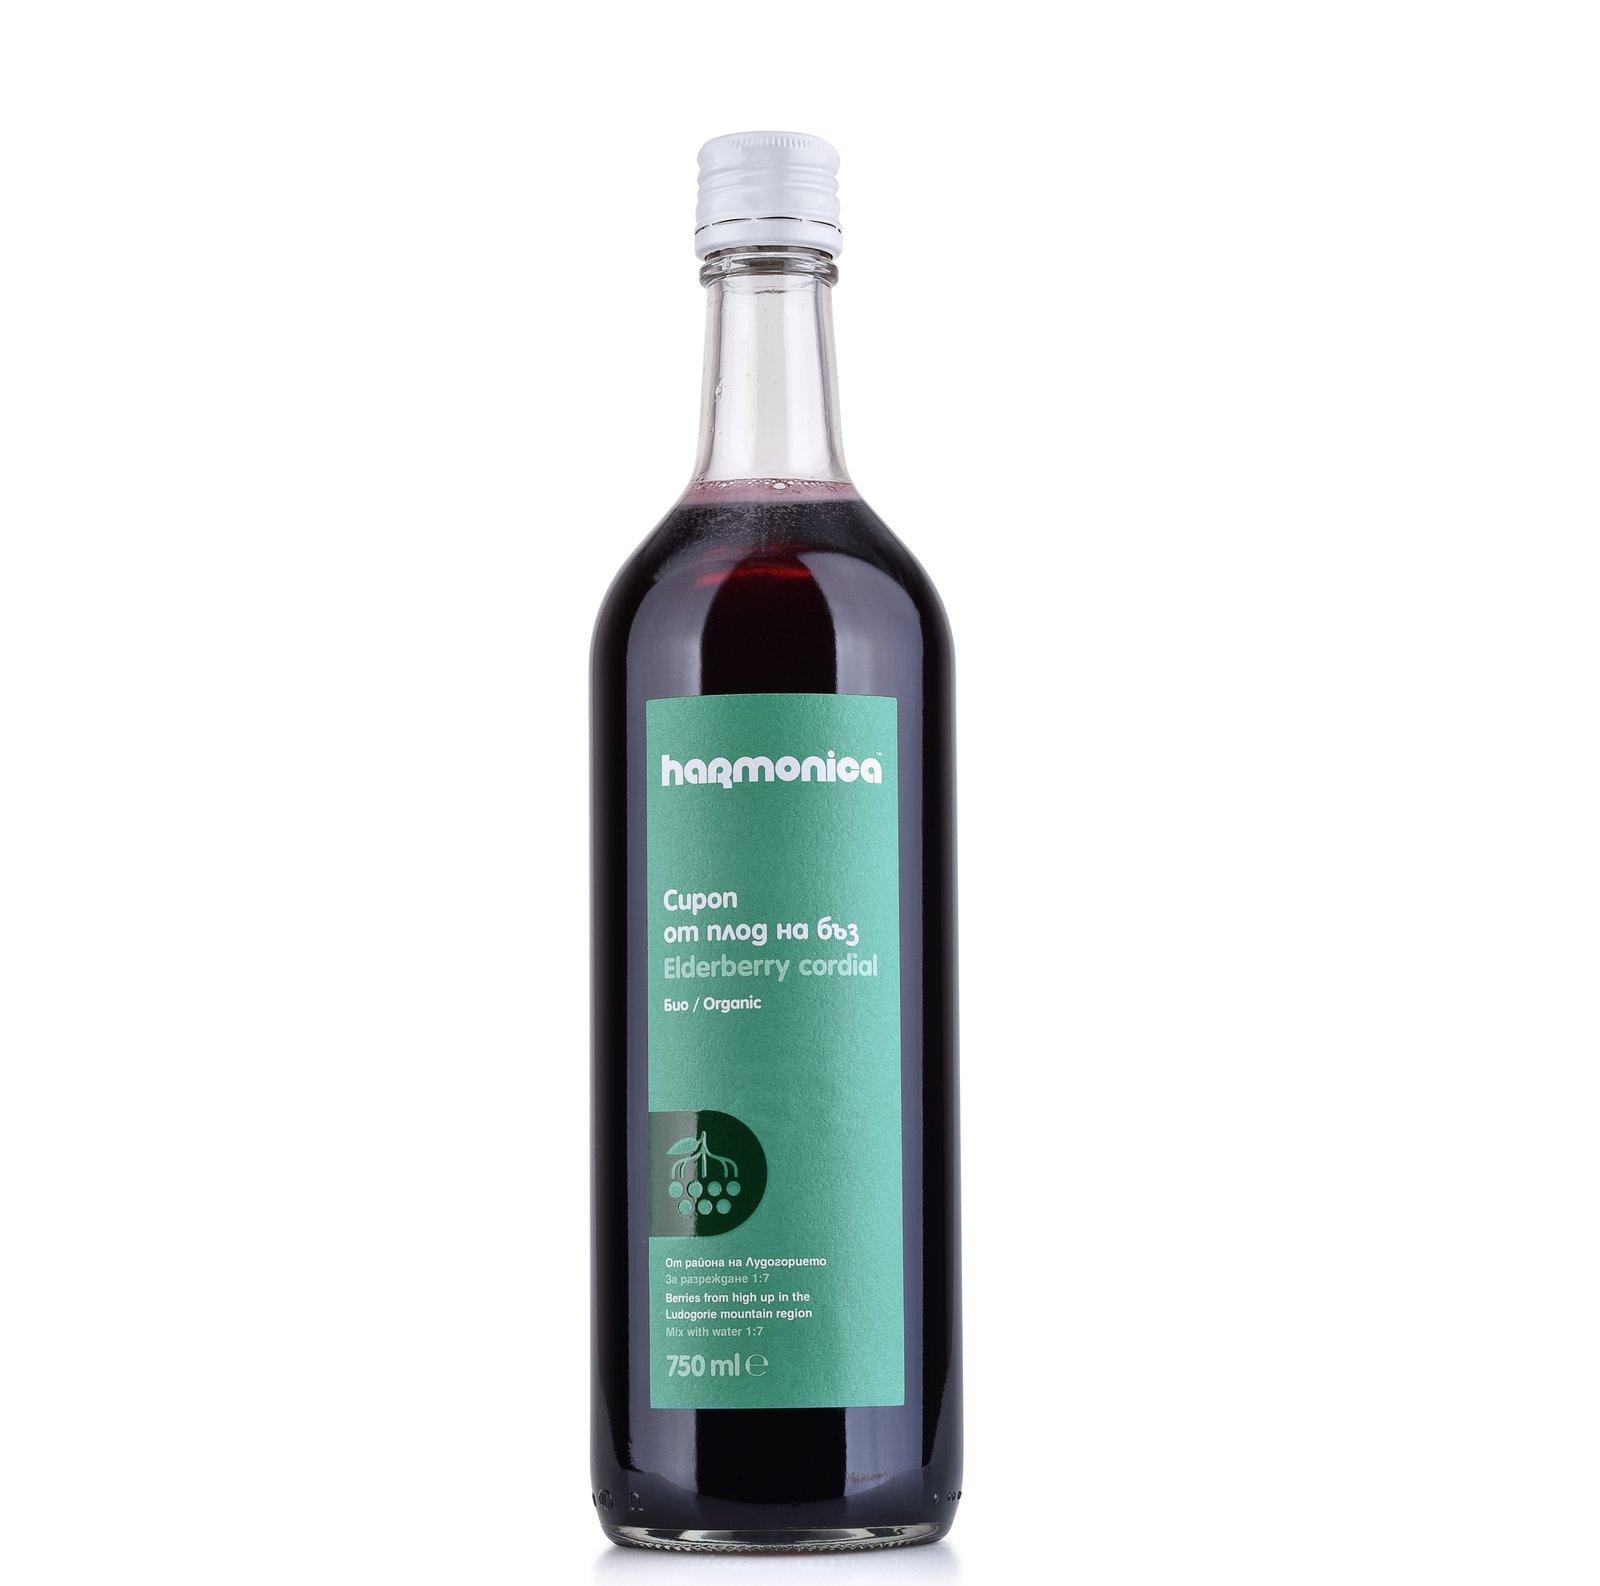 Bio Sirop Din Fructe De Soc Harmonica 750 Ml Nourish Biomarket